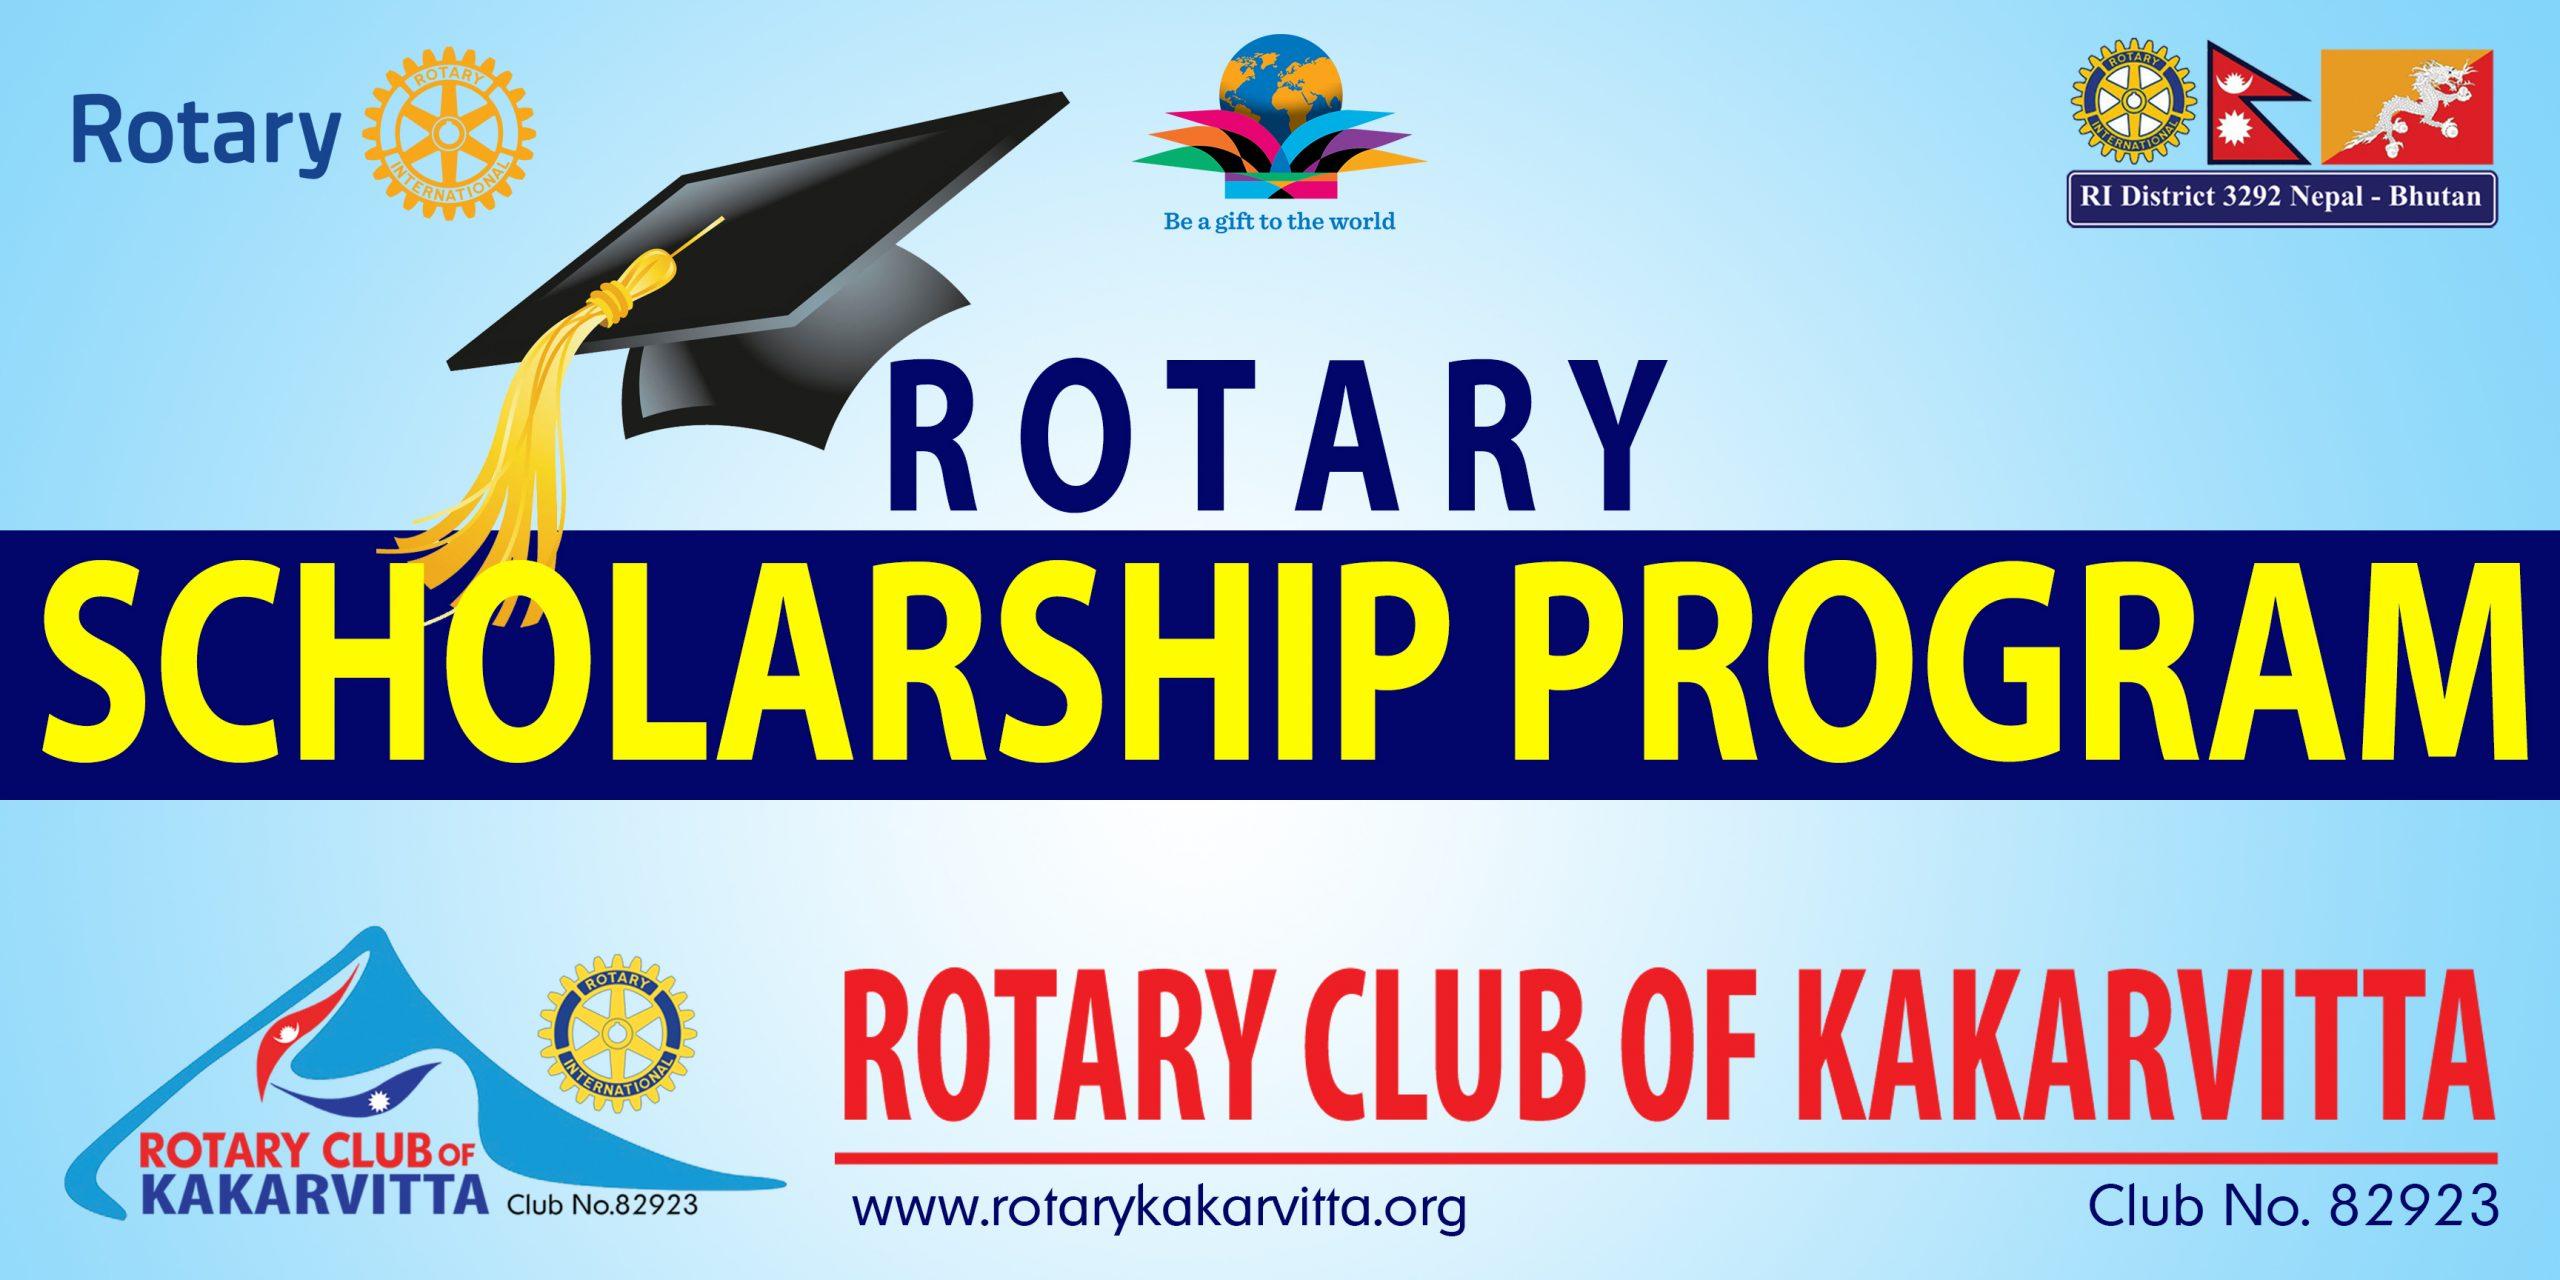 5 Scholarship Distribution Rotary Club Of Kakarvitta